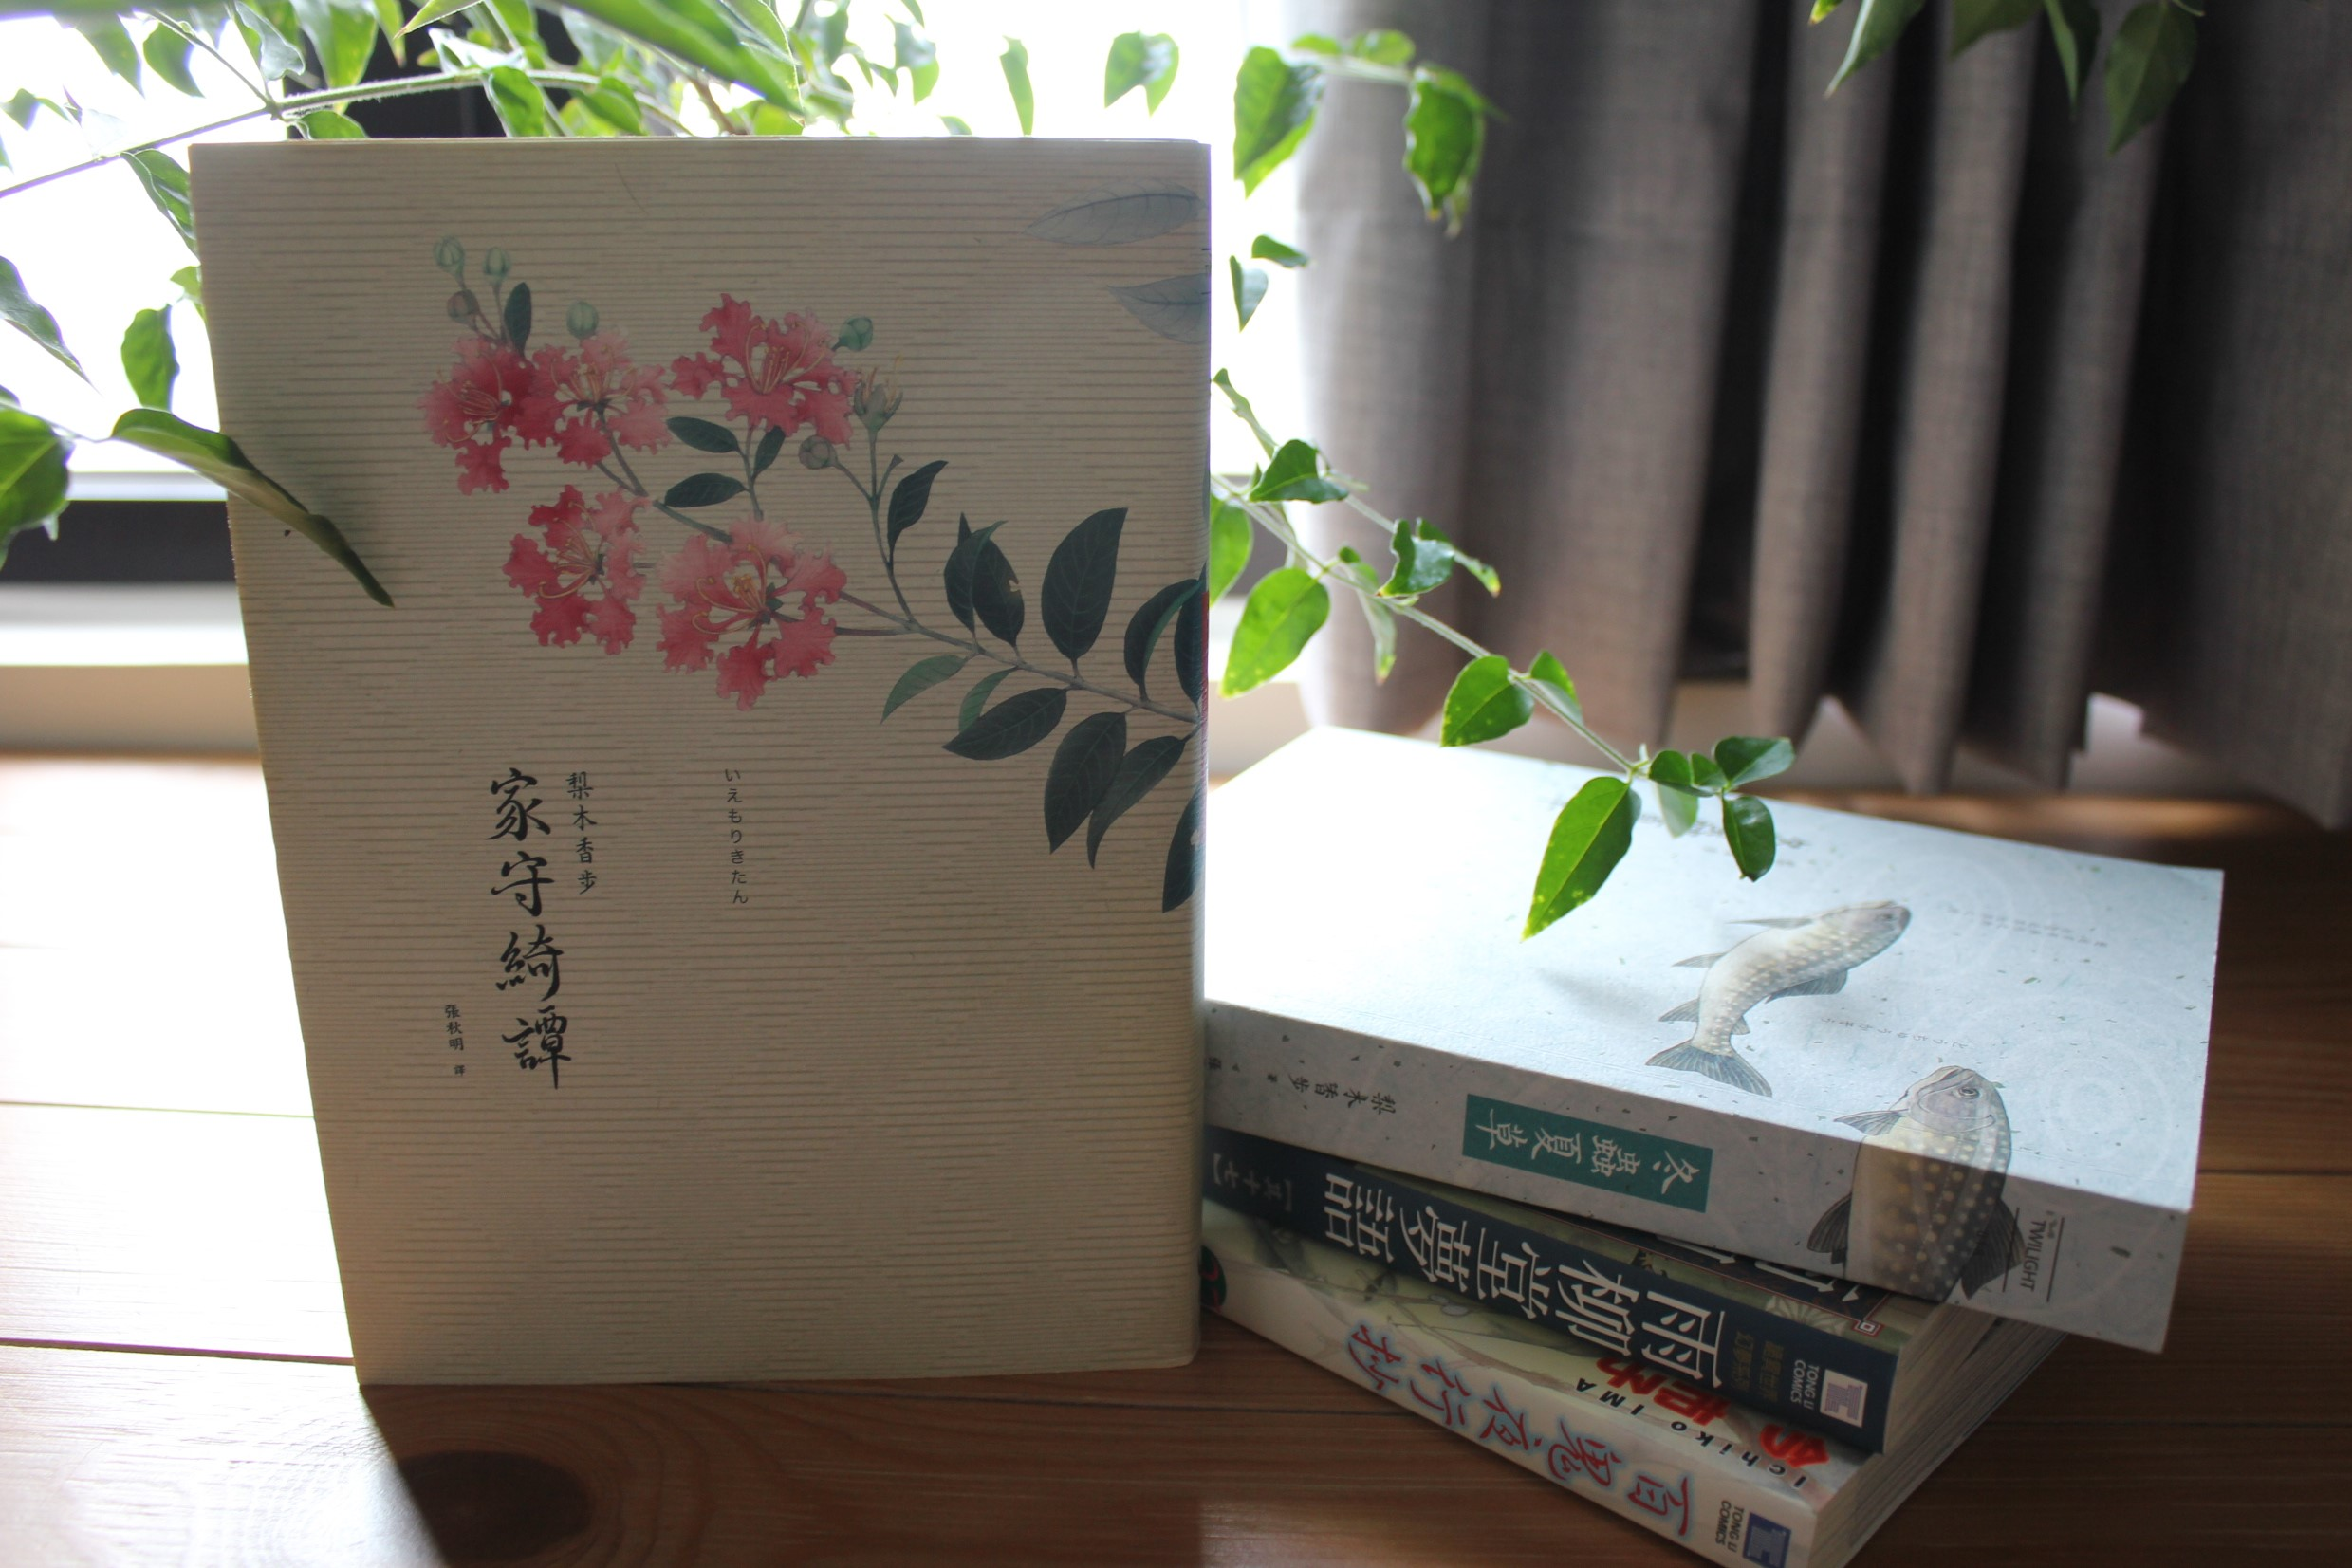 第11集(2021/6/1)WFH Book-hopping Challenge Day 1: 宅在家之必要